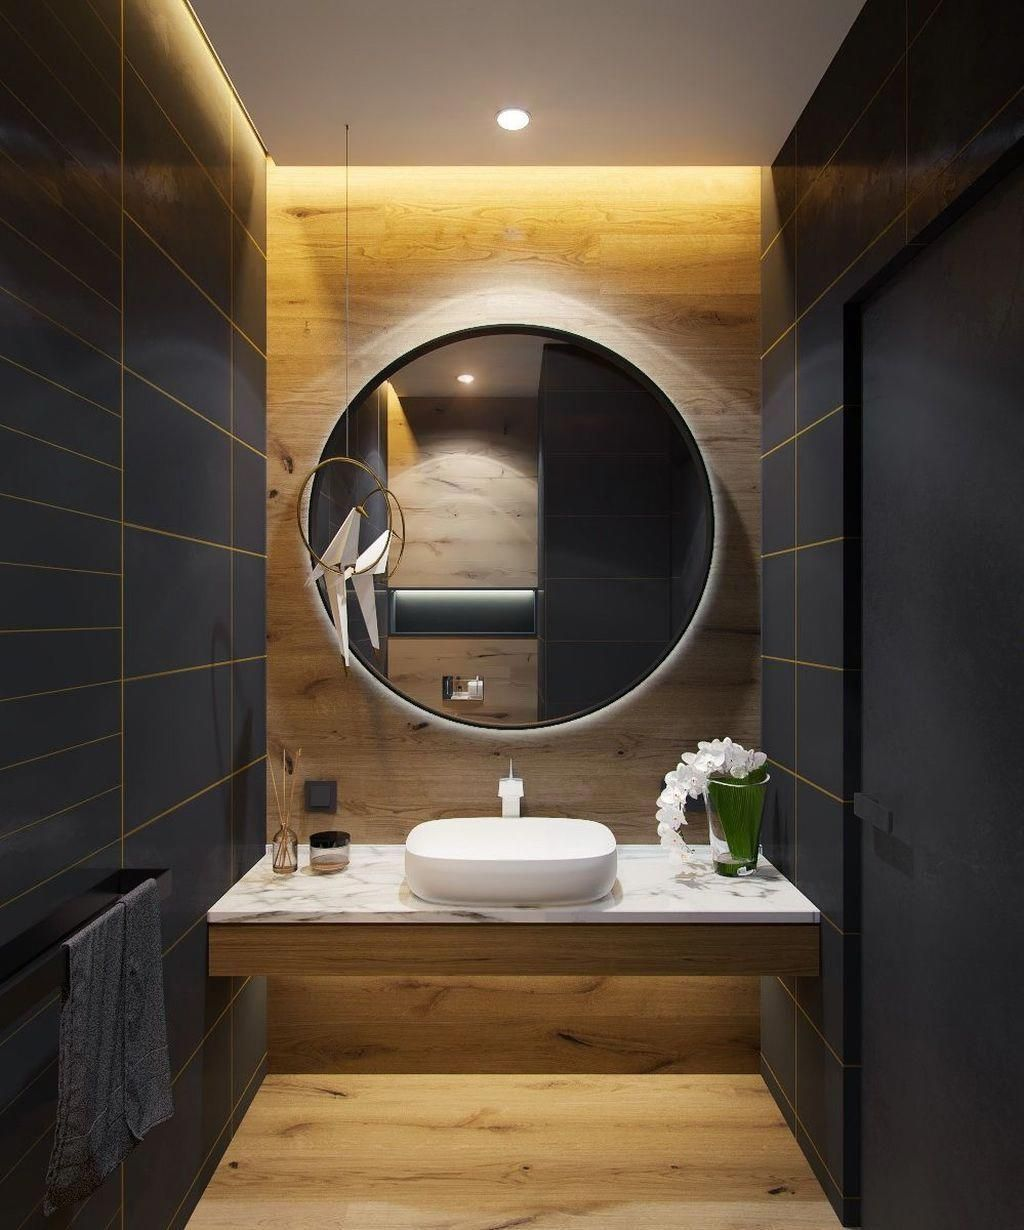 38 Cozy Small Office Bathroom Designs Ideas Washroomdesign